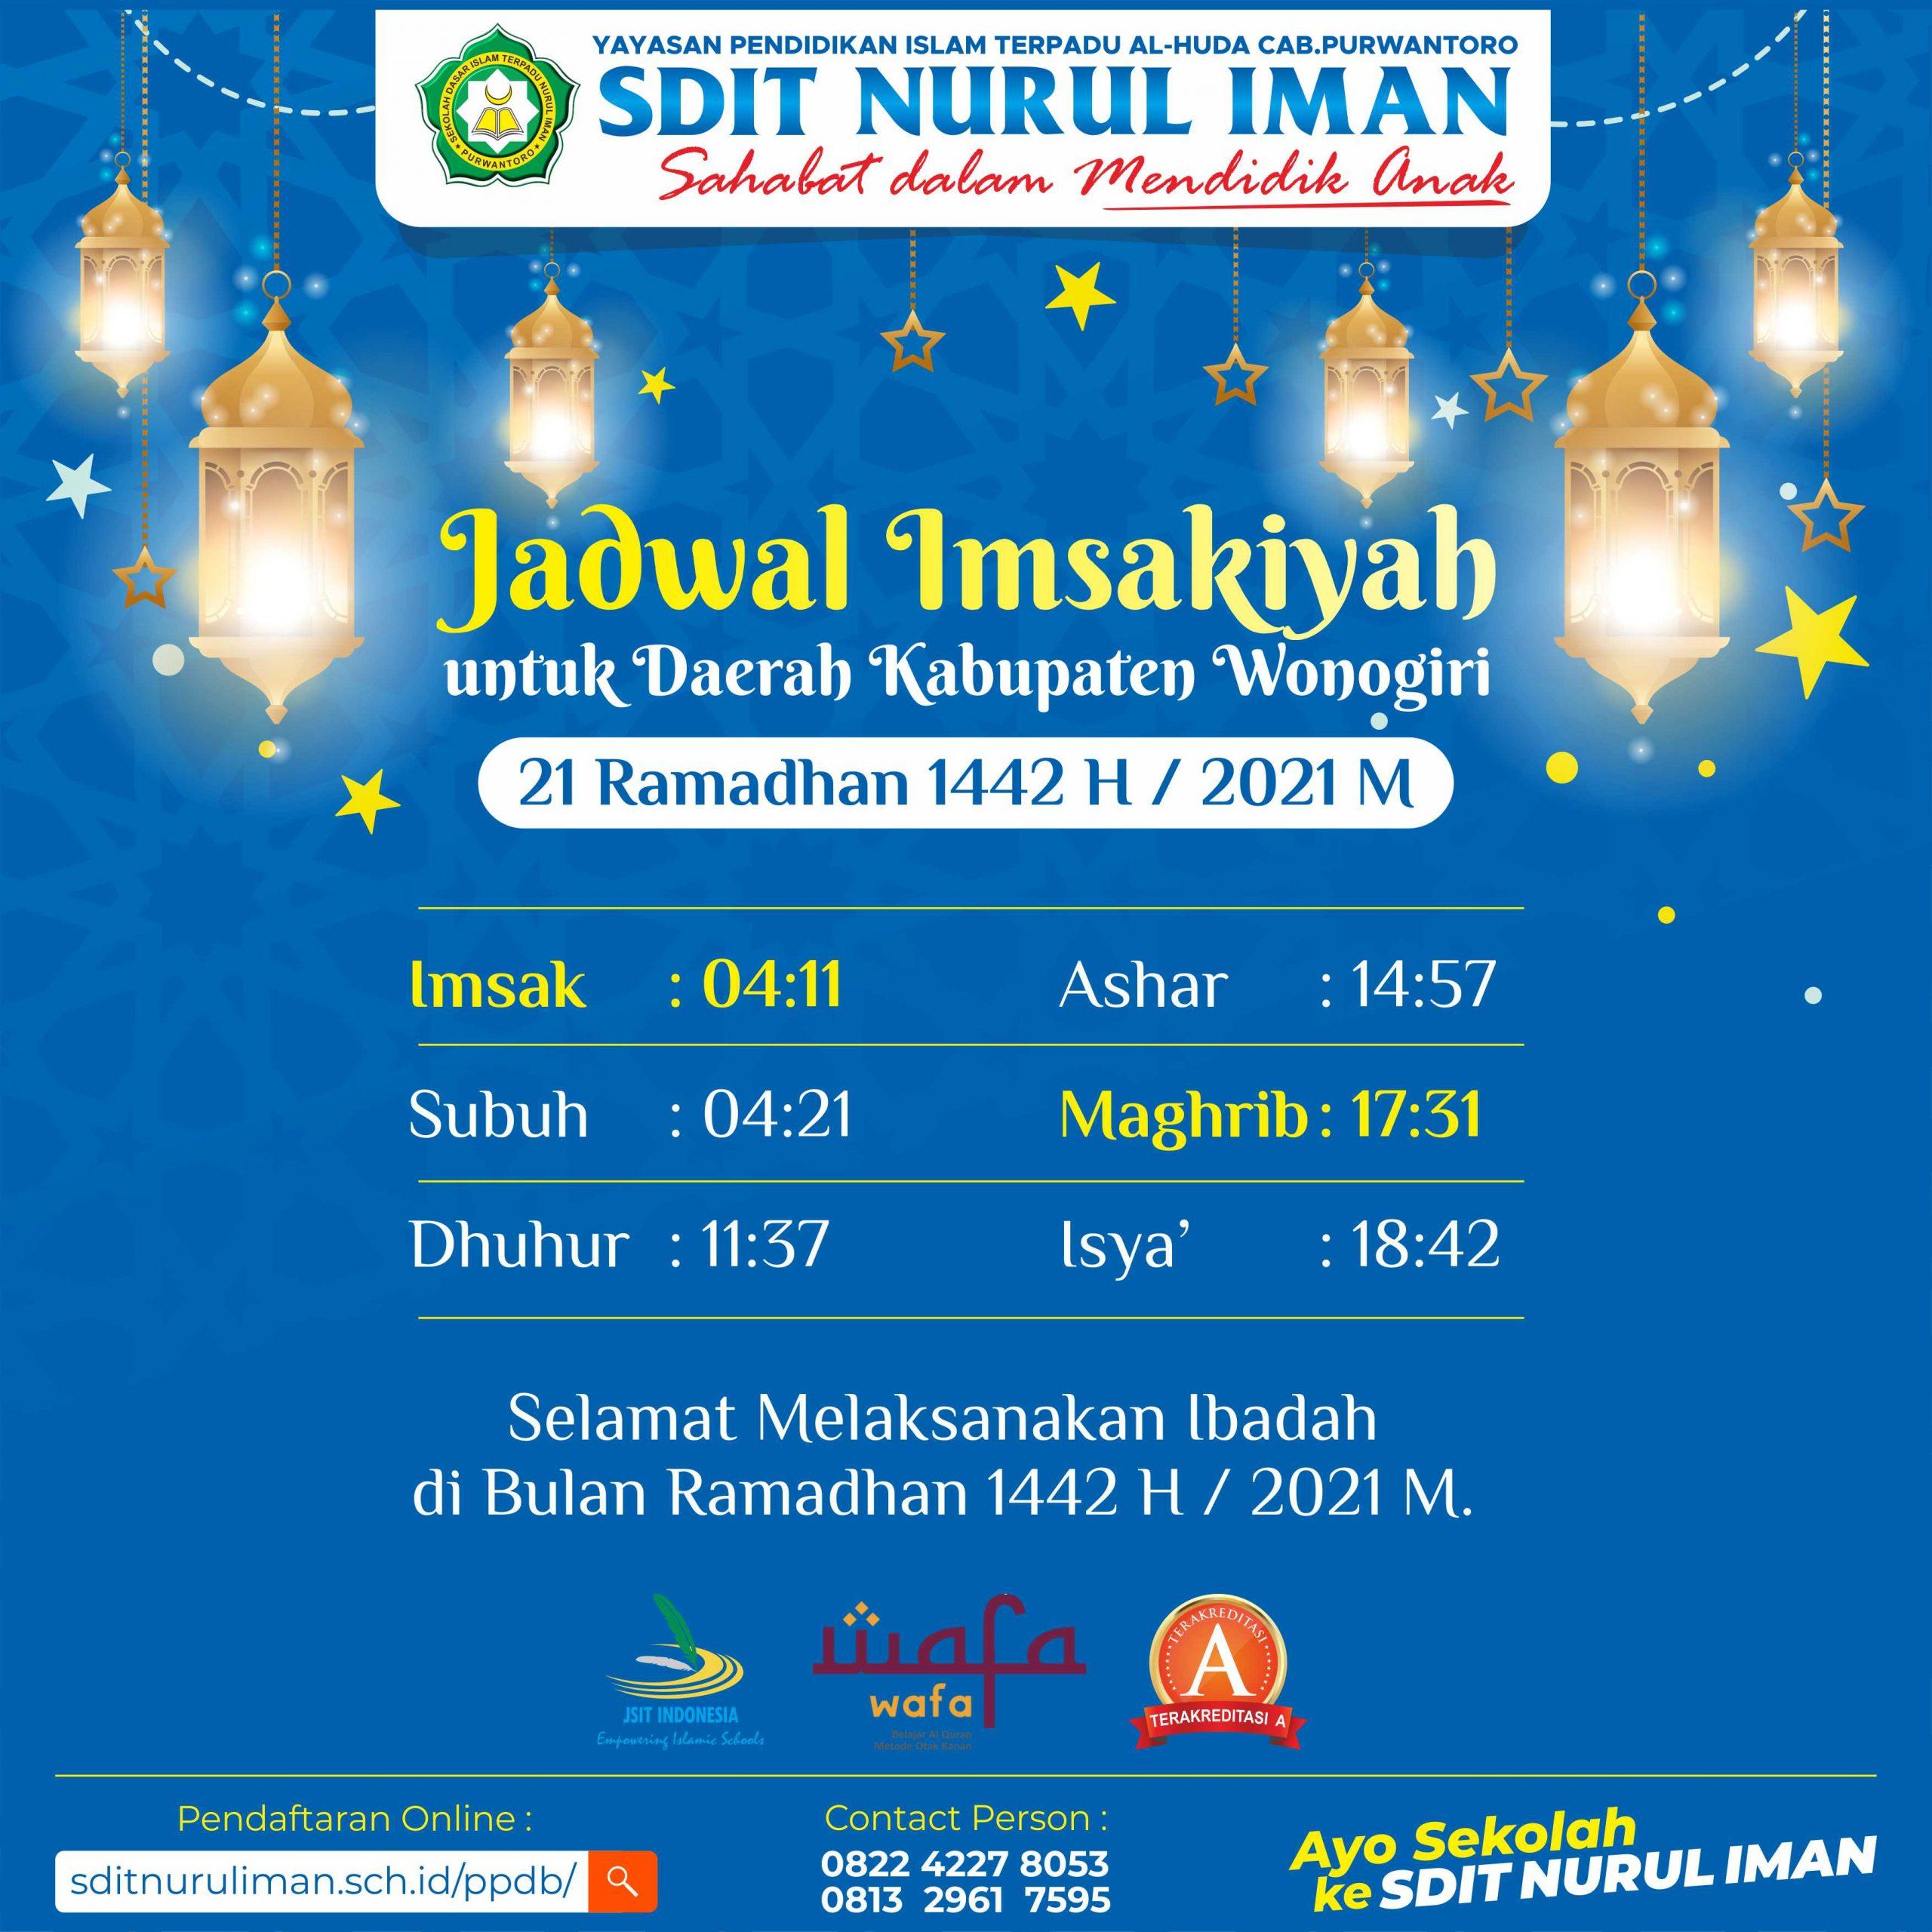 21 Ramadhan 1442 H